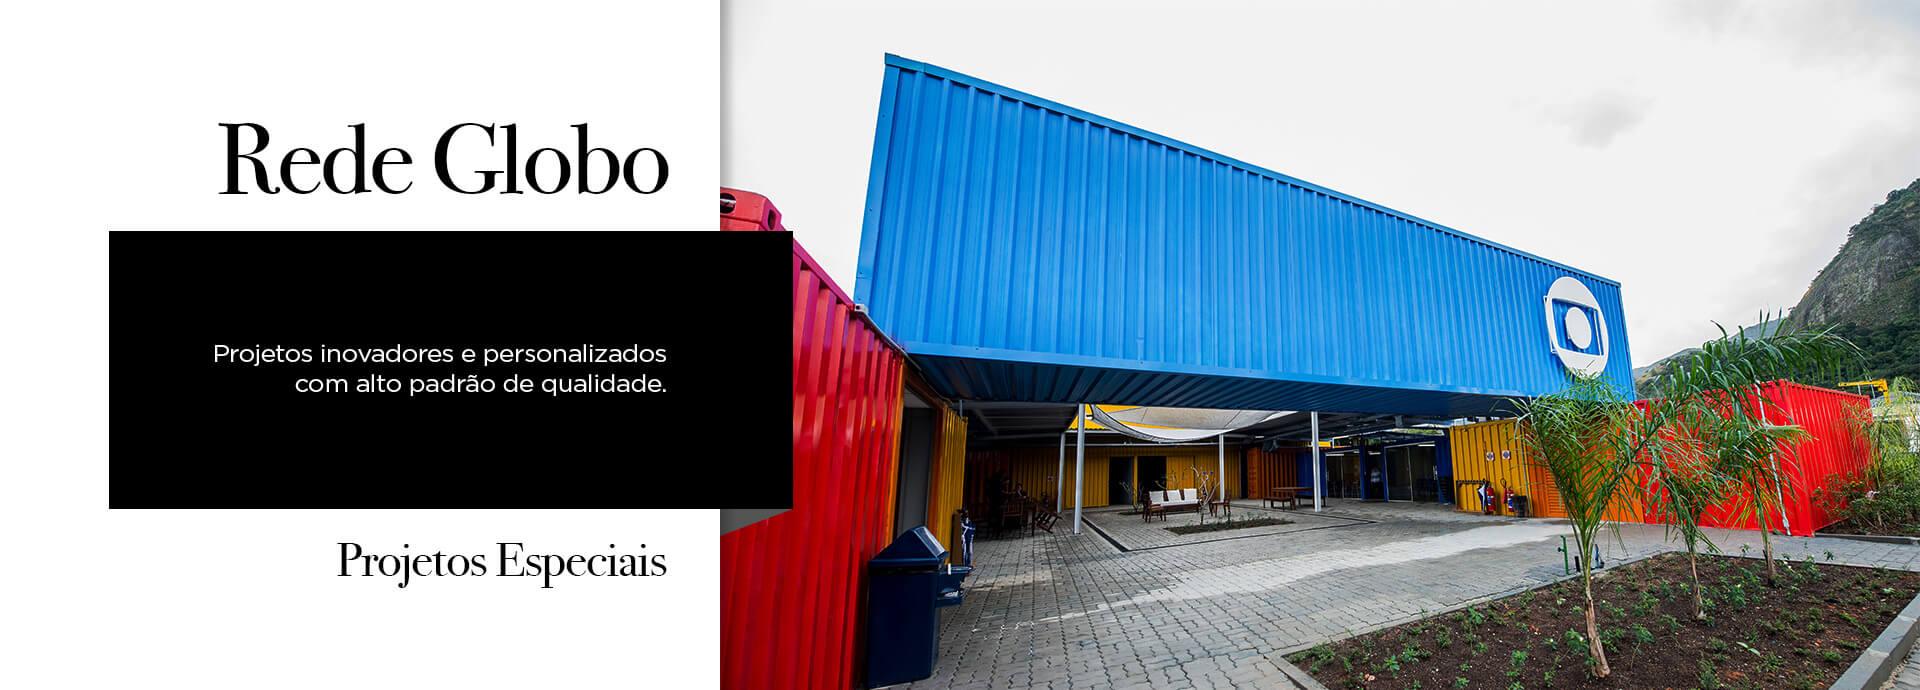 Projeto Especial Container Globo